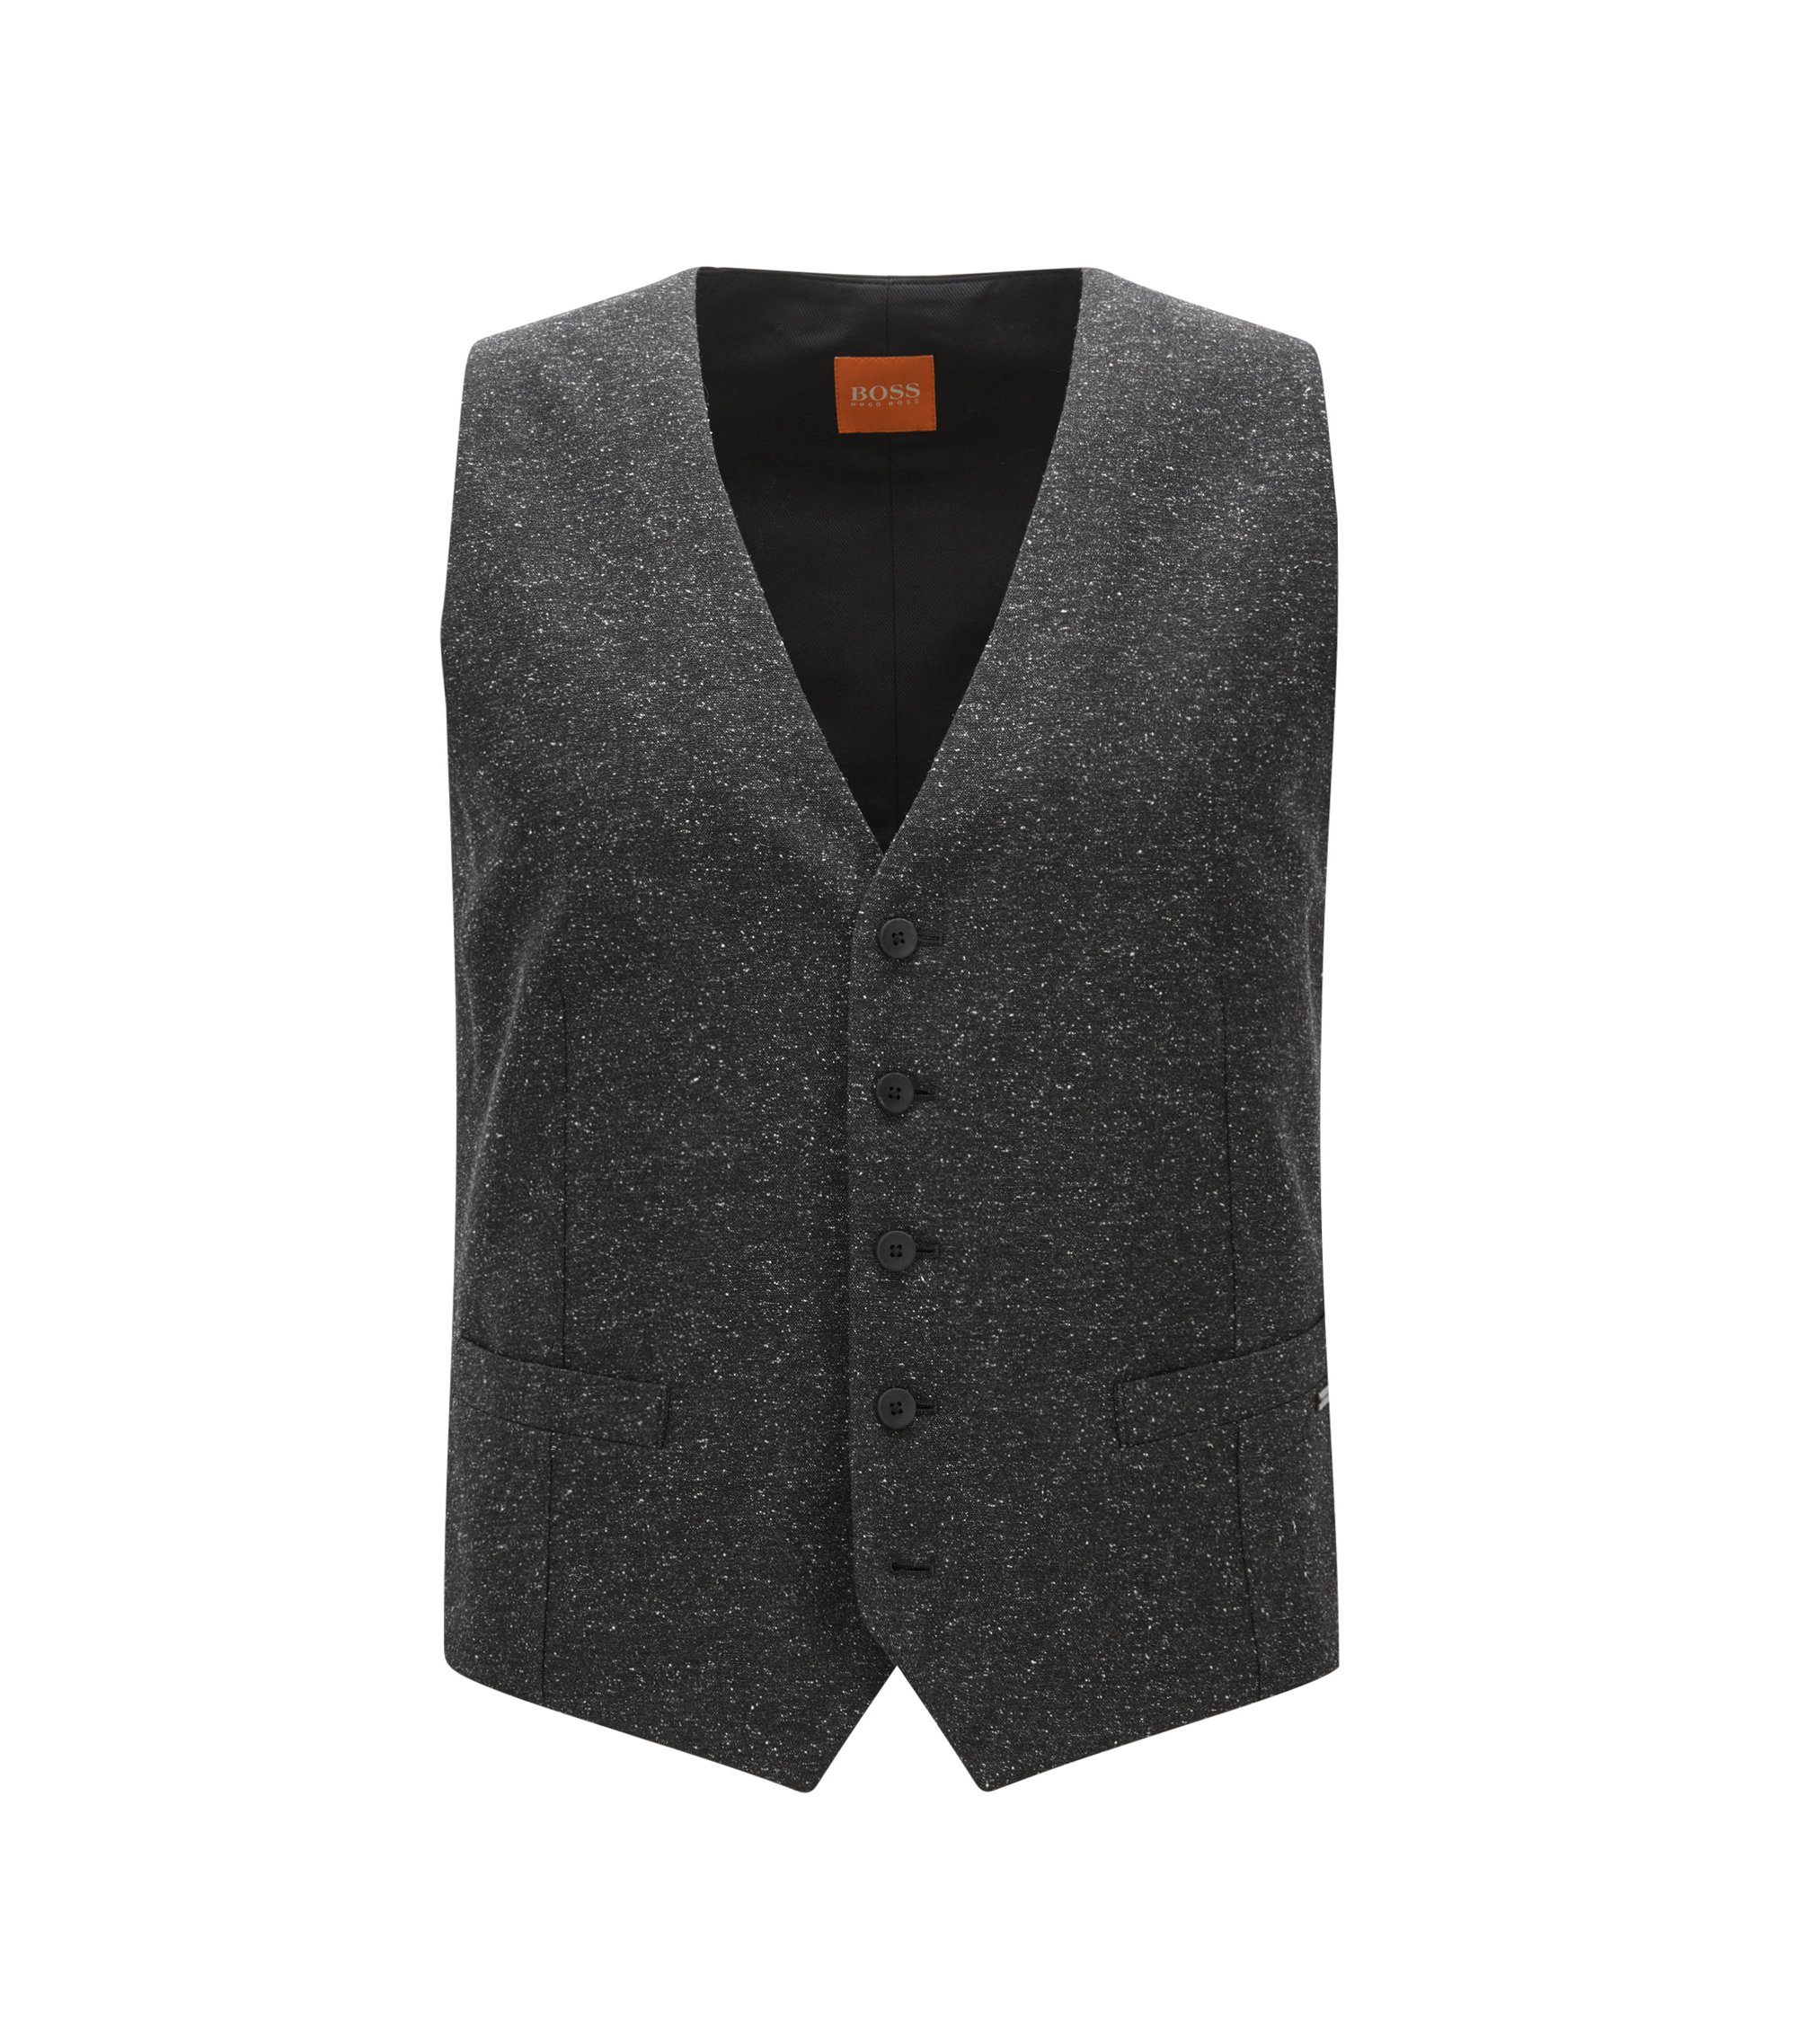 Wool Blend Waistcoat, Slim Fit | Bacer, Black